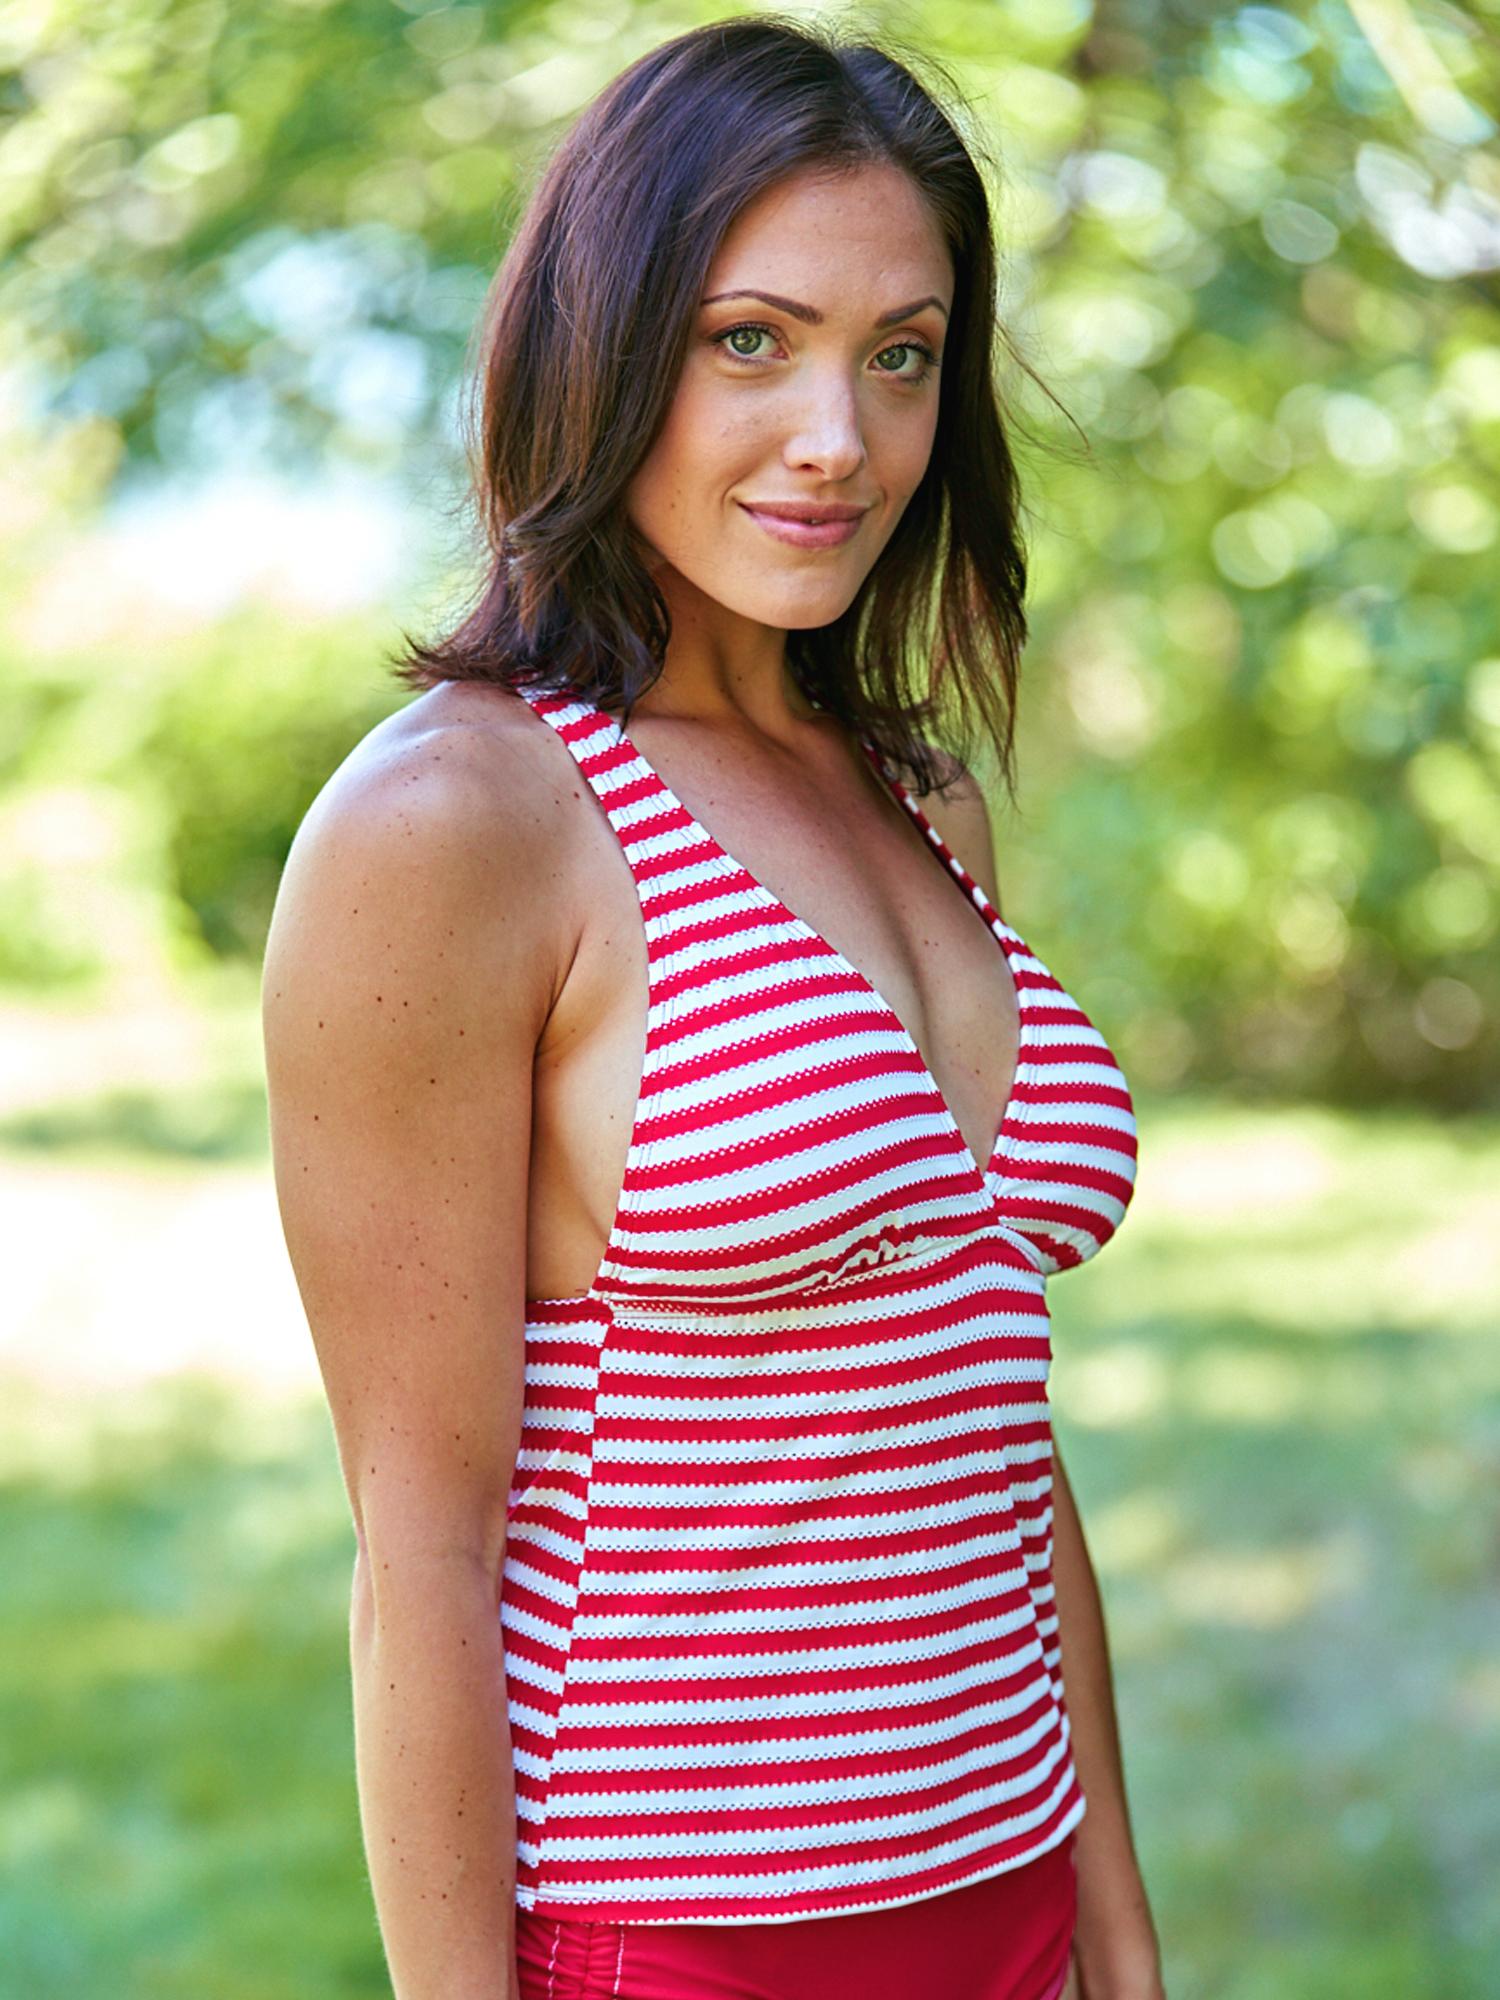 White   Womens ONeill Tops SHANA Naked   News As Rx